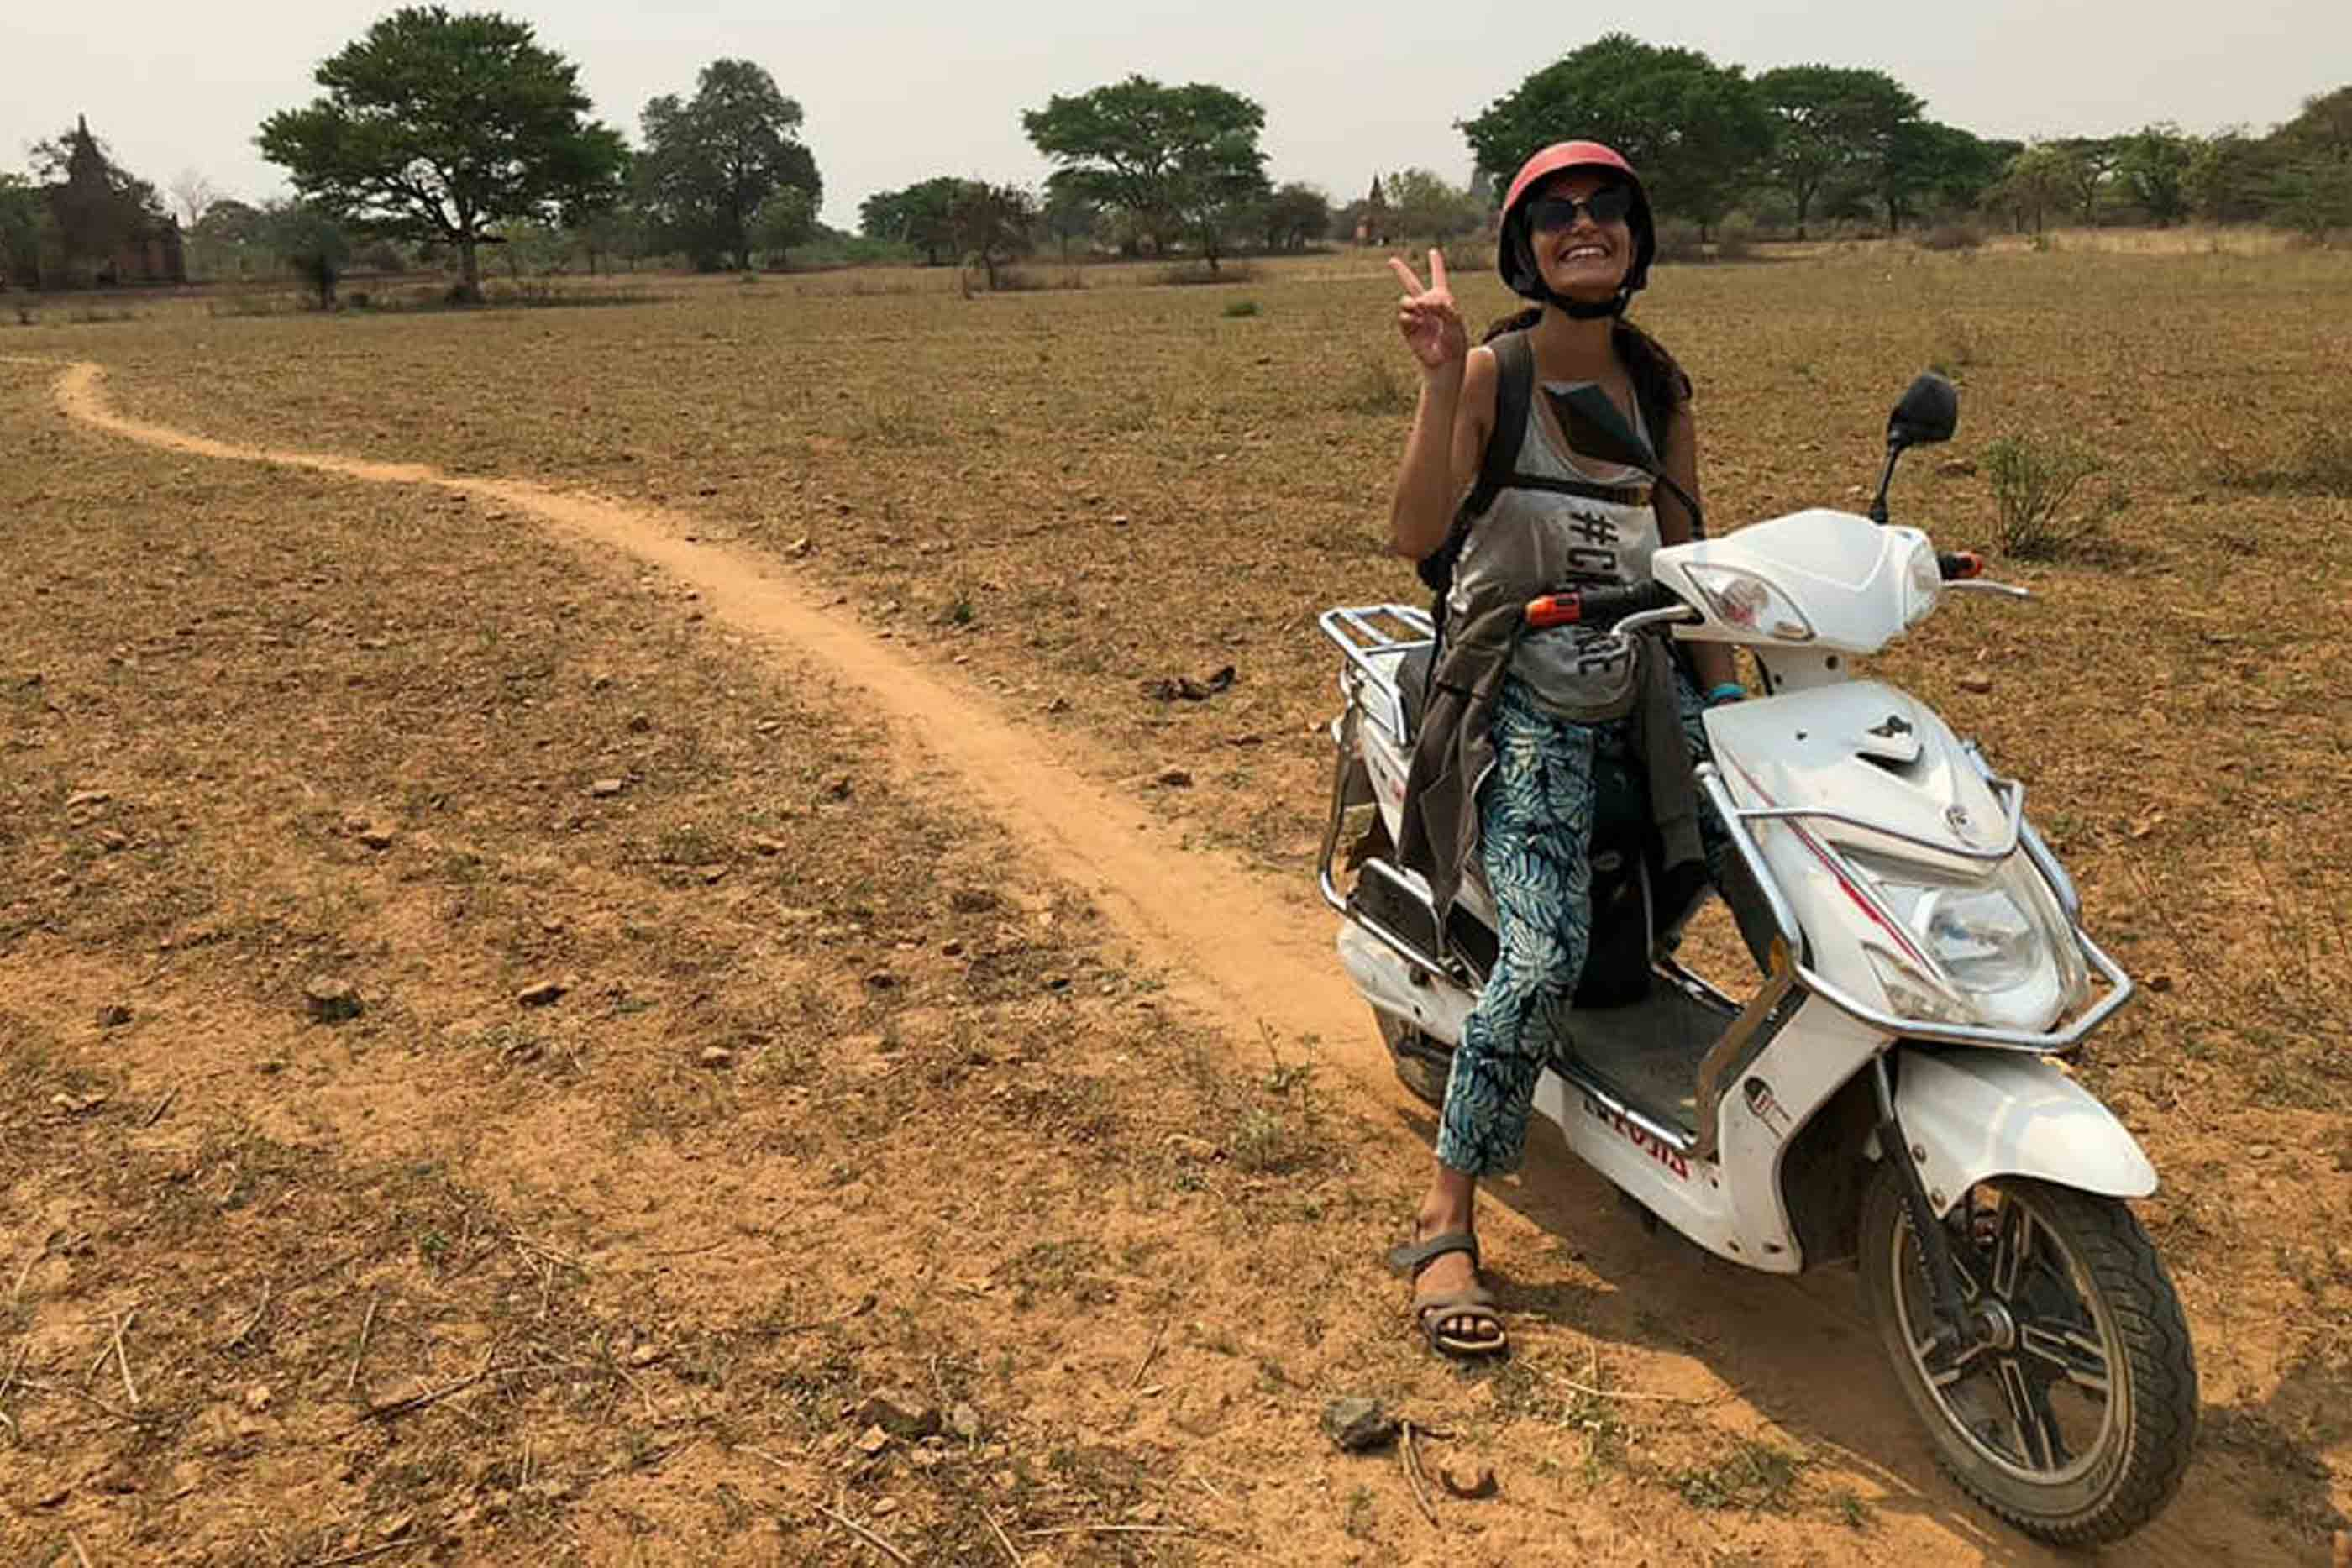 Rita num passeio de mota no Myanmar durante o seu gap year